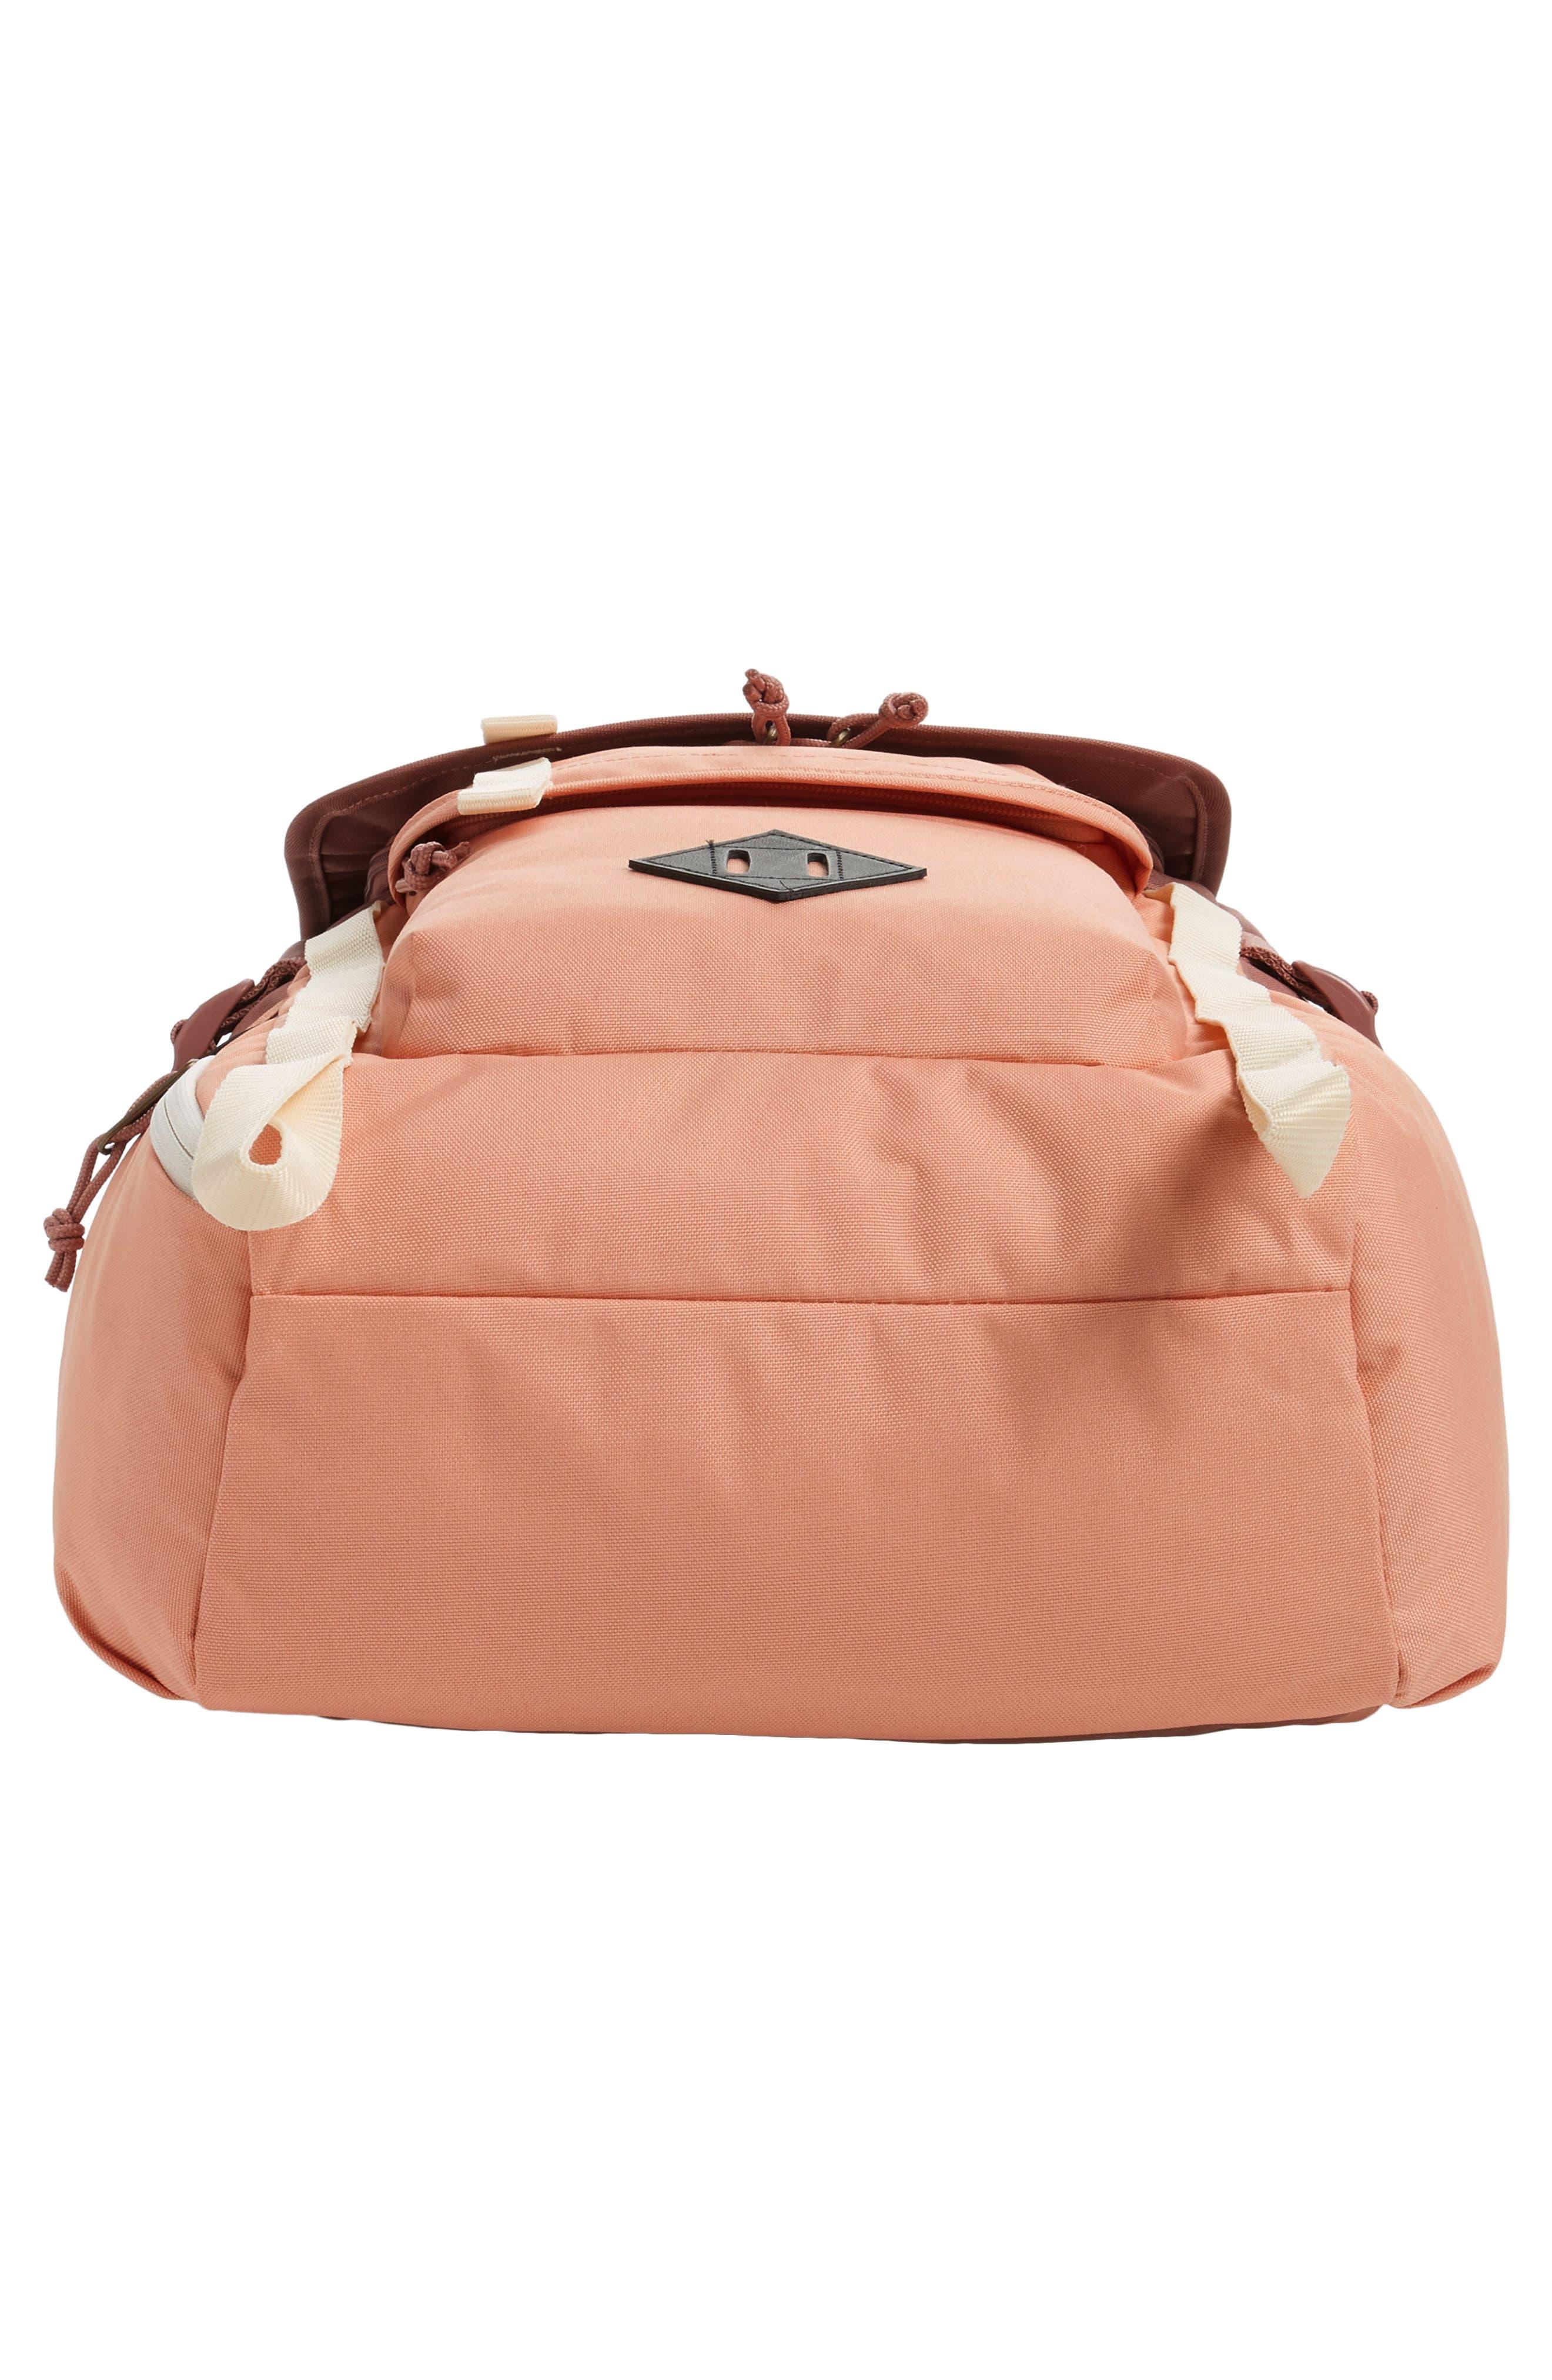 JANSPORT, Hatchet Backpack, Alternate thumbnail 7, color, MOCHA/ CLAY